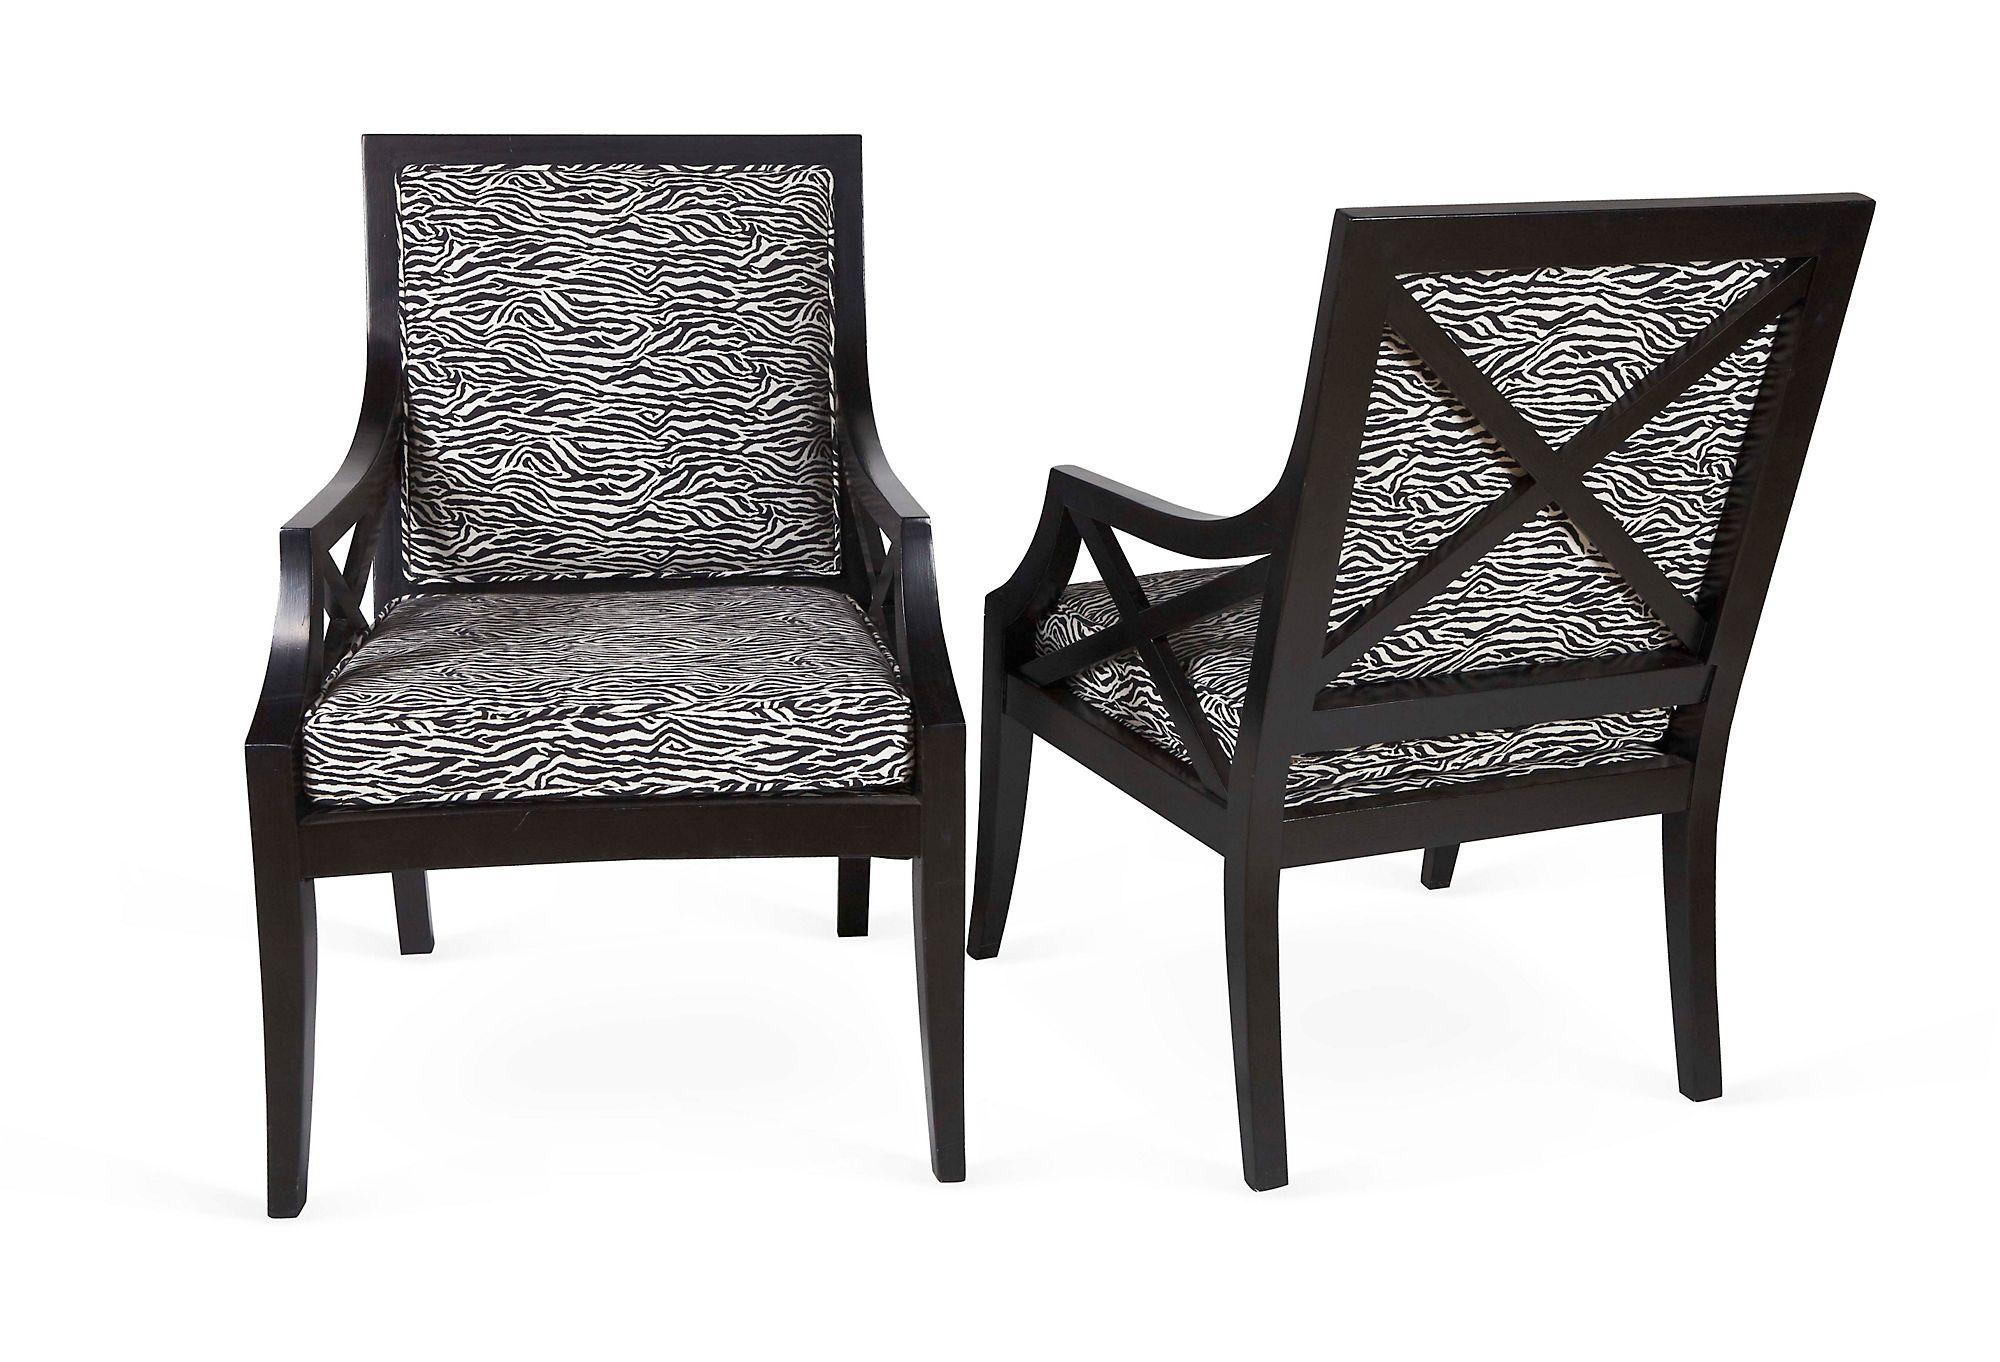 Zebra Chairs | Condo living room, Zebra chair, Condo living